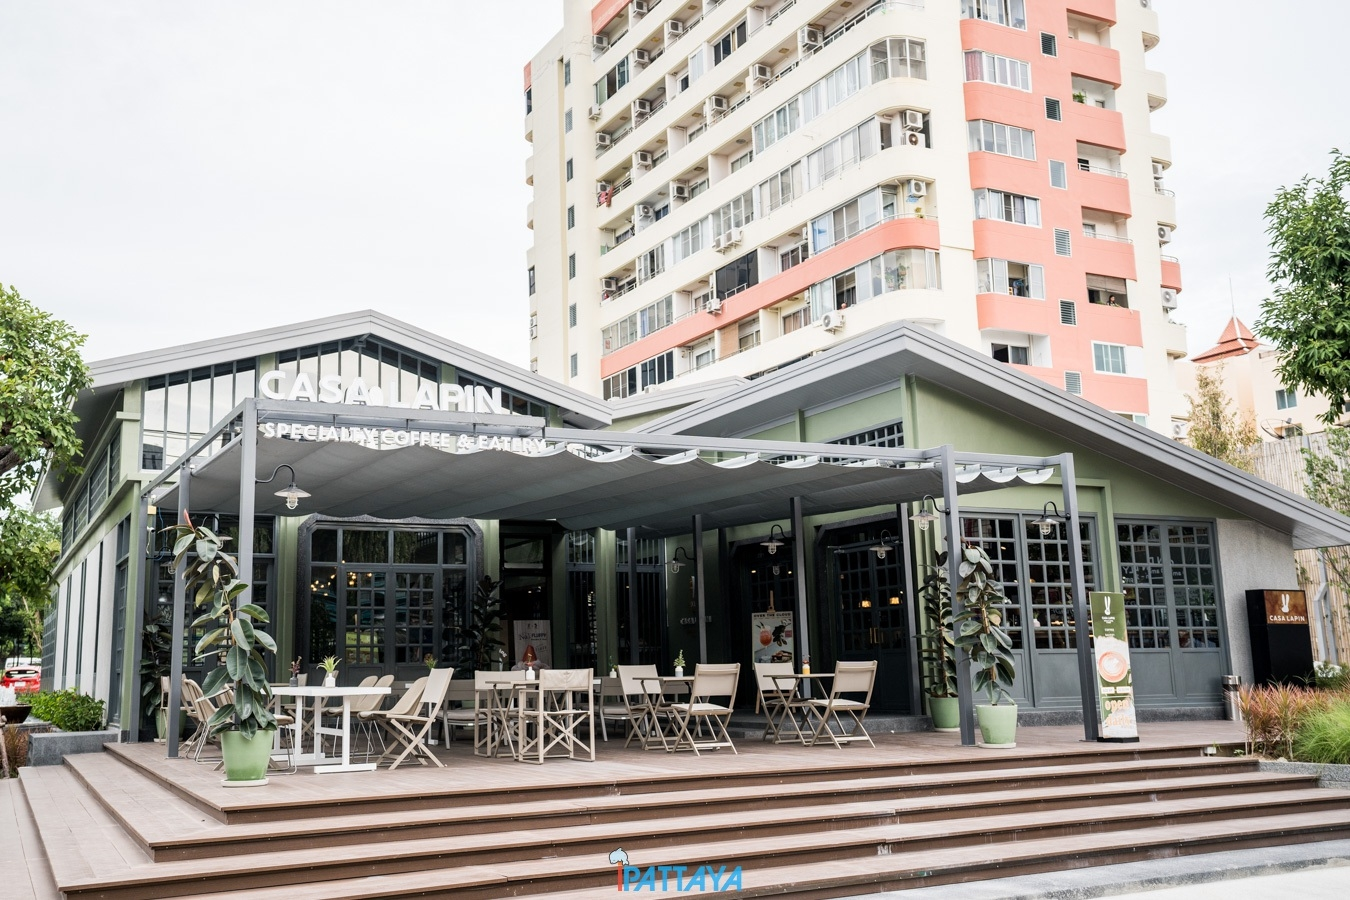 Casa Lapin XL Pattaya คาเฟ่สุดฮิตพัทยาของคนรักกาแฟตัวจริง ...